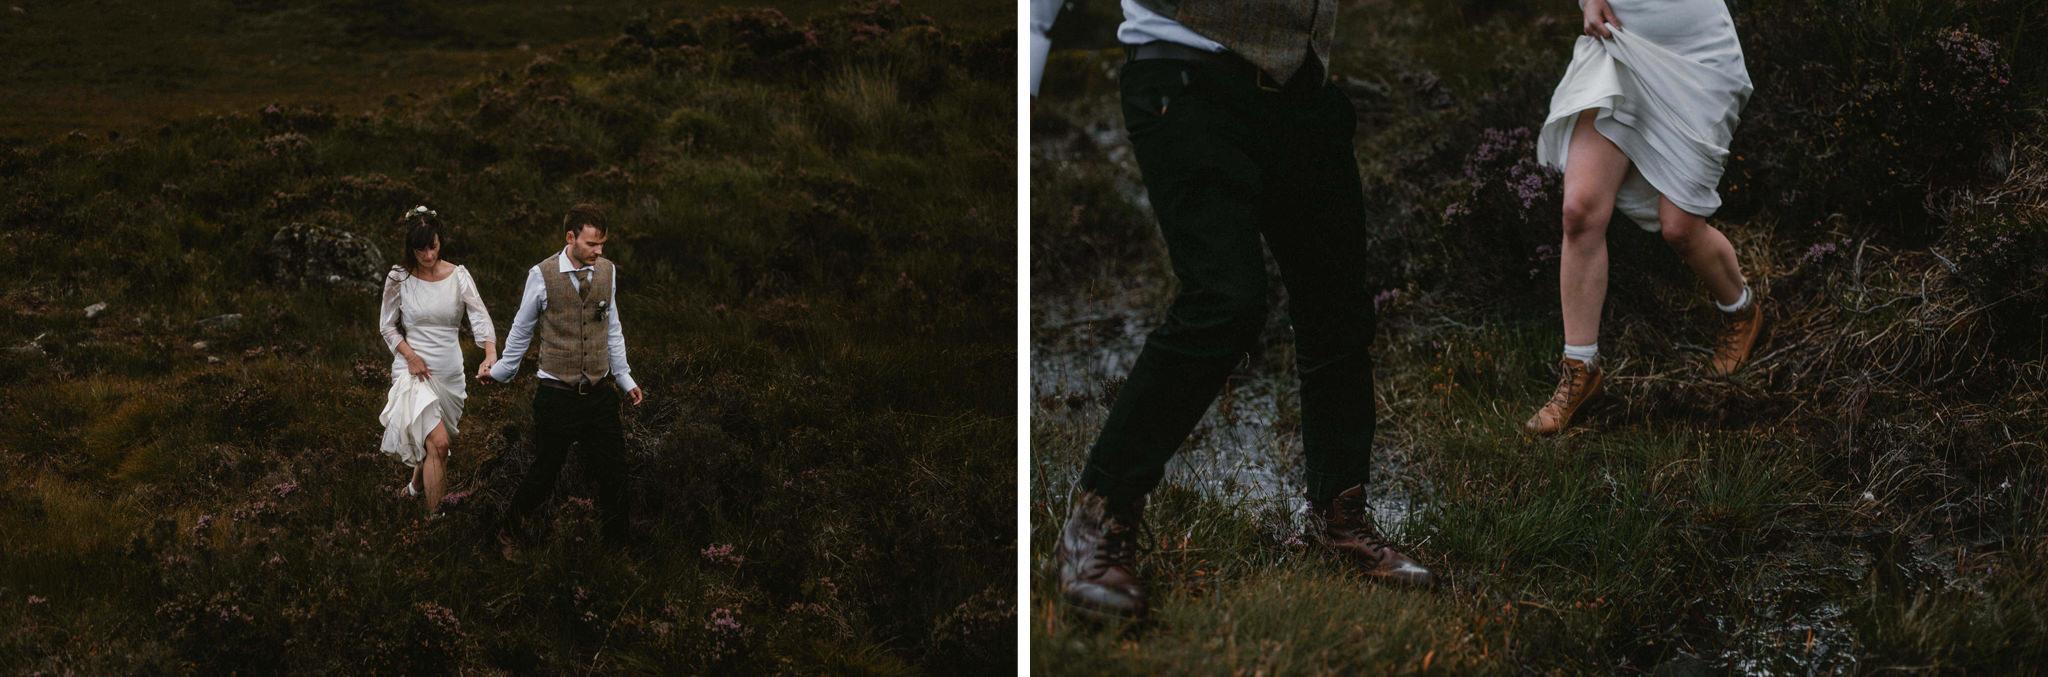 Isle of Skye elopement couple explore muddy hillside